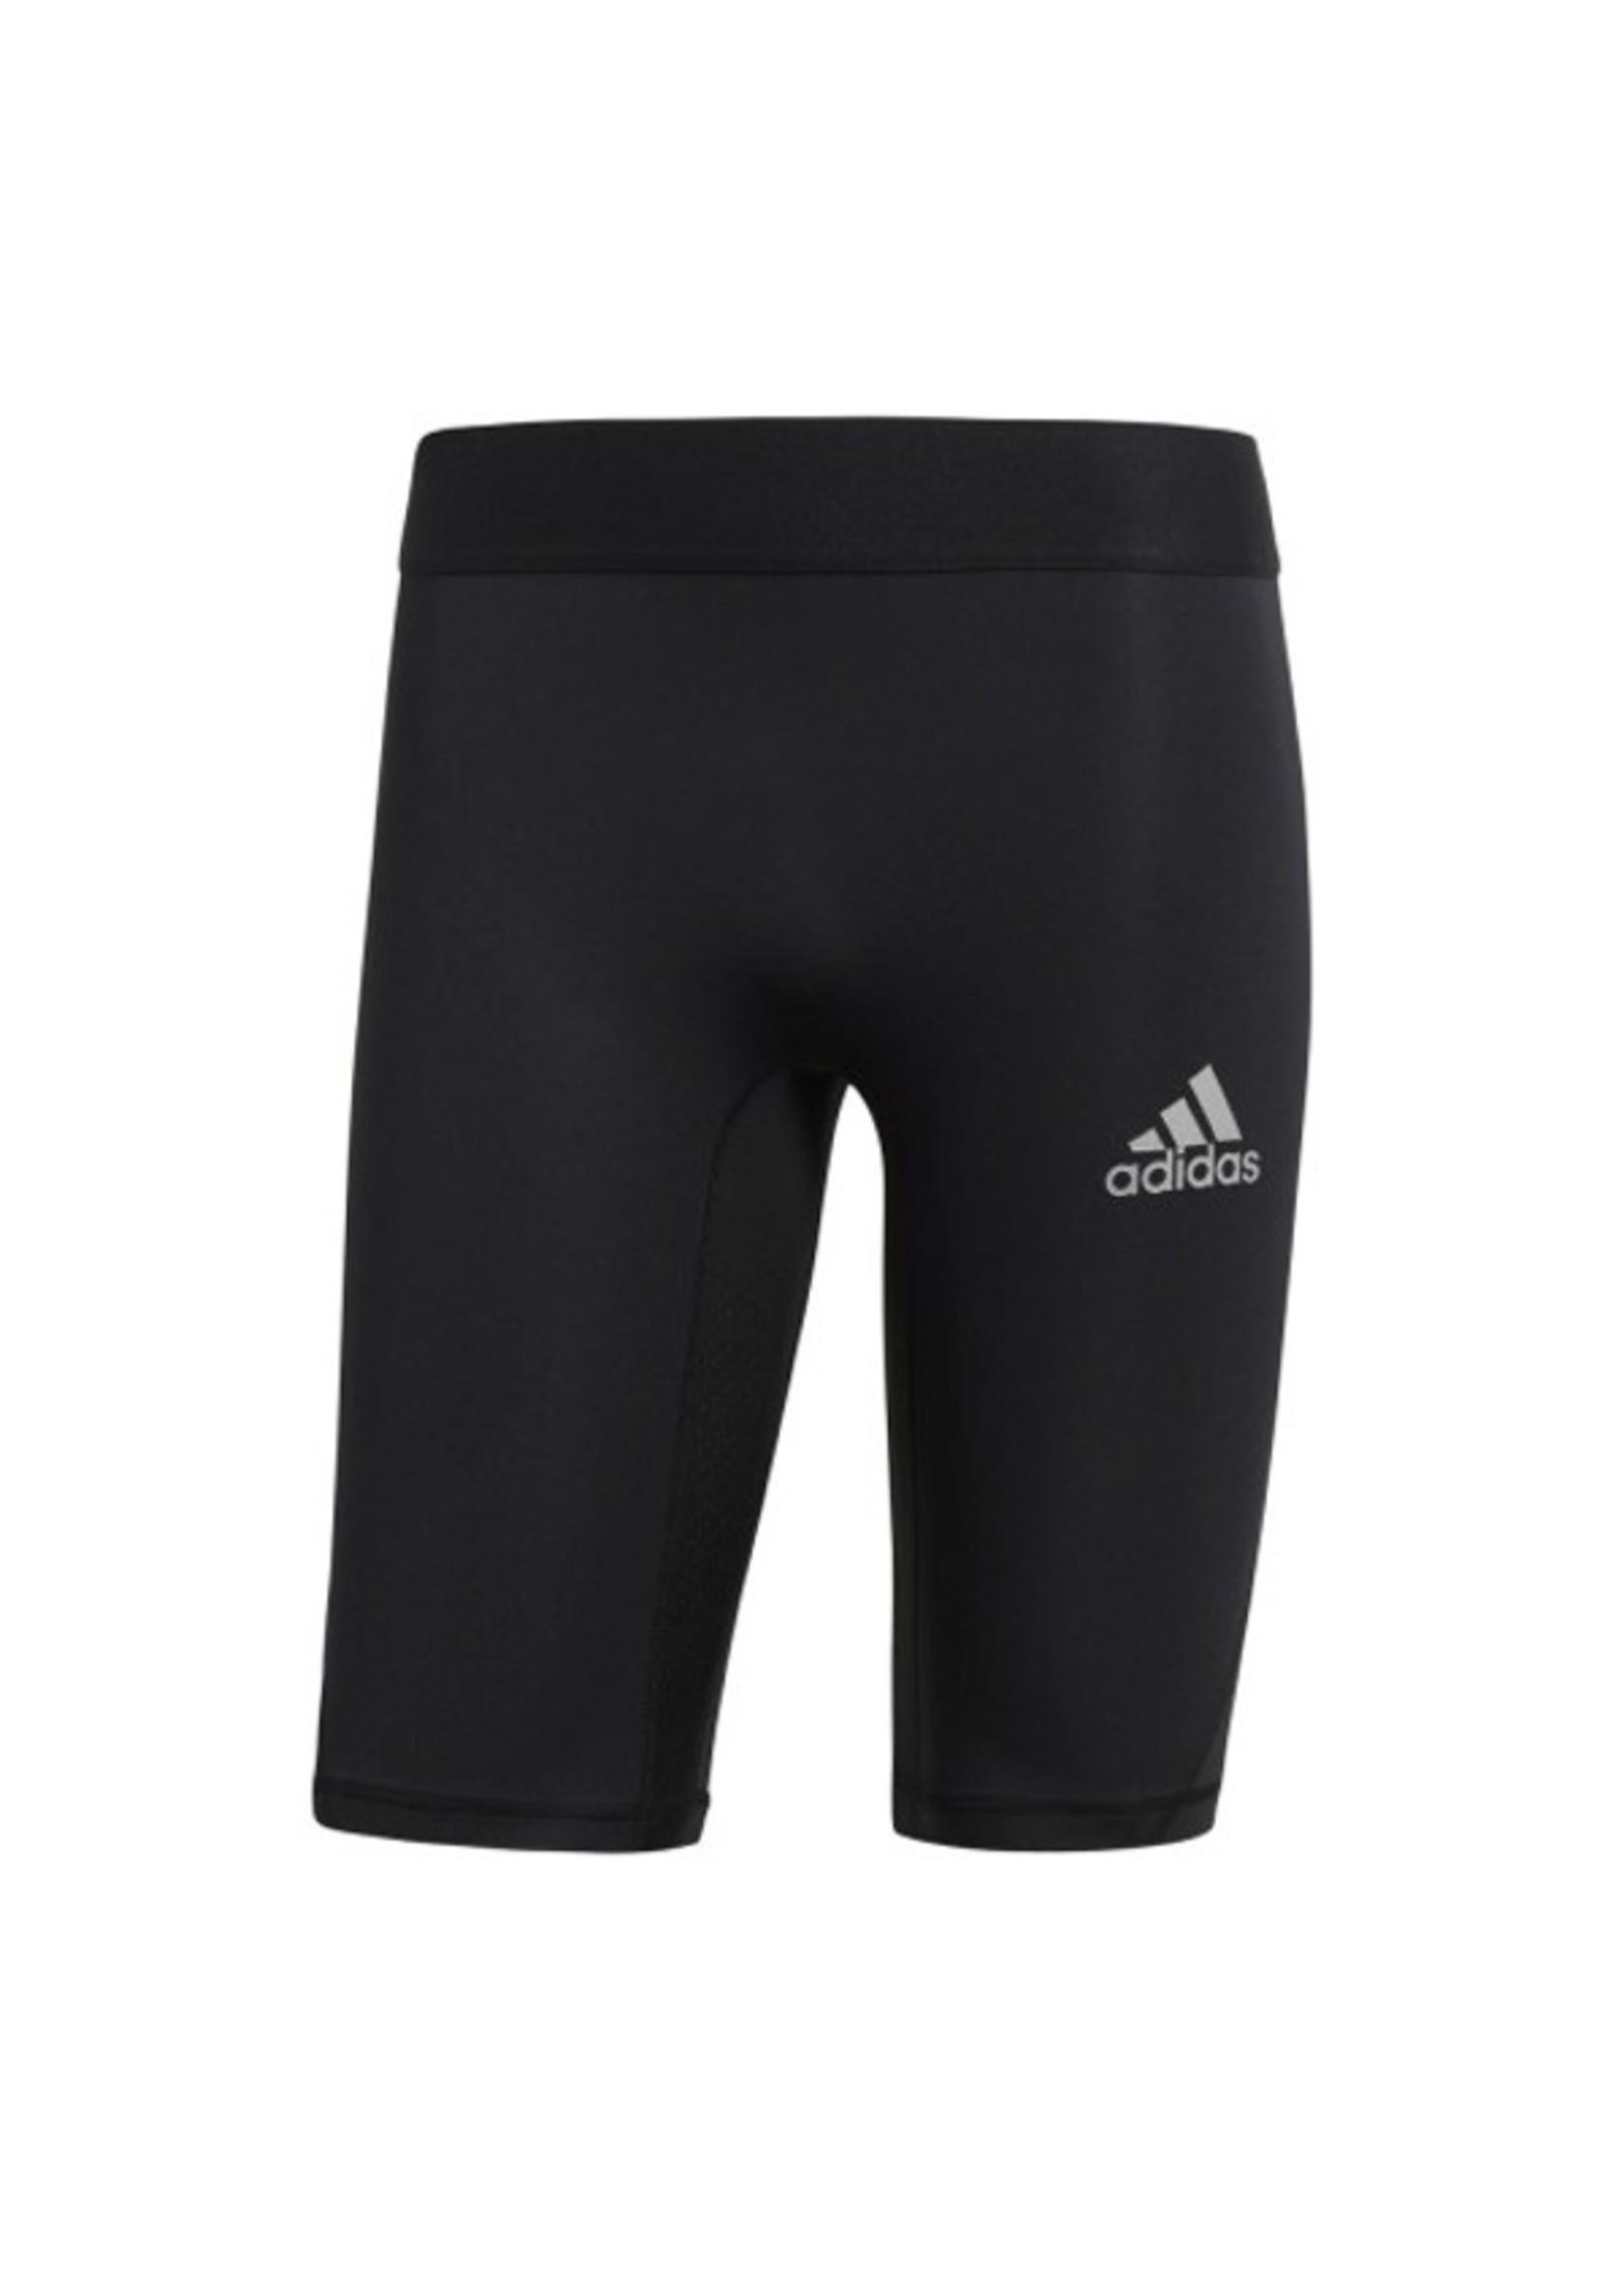 Adidas Compression Black Short Youth